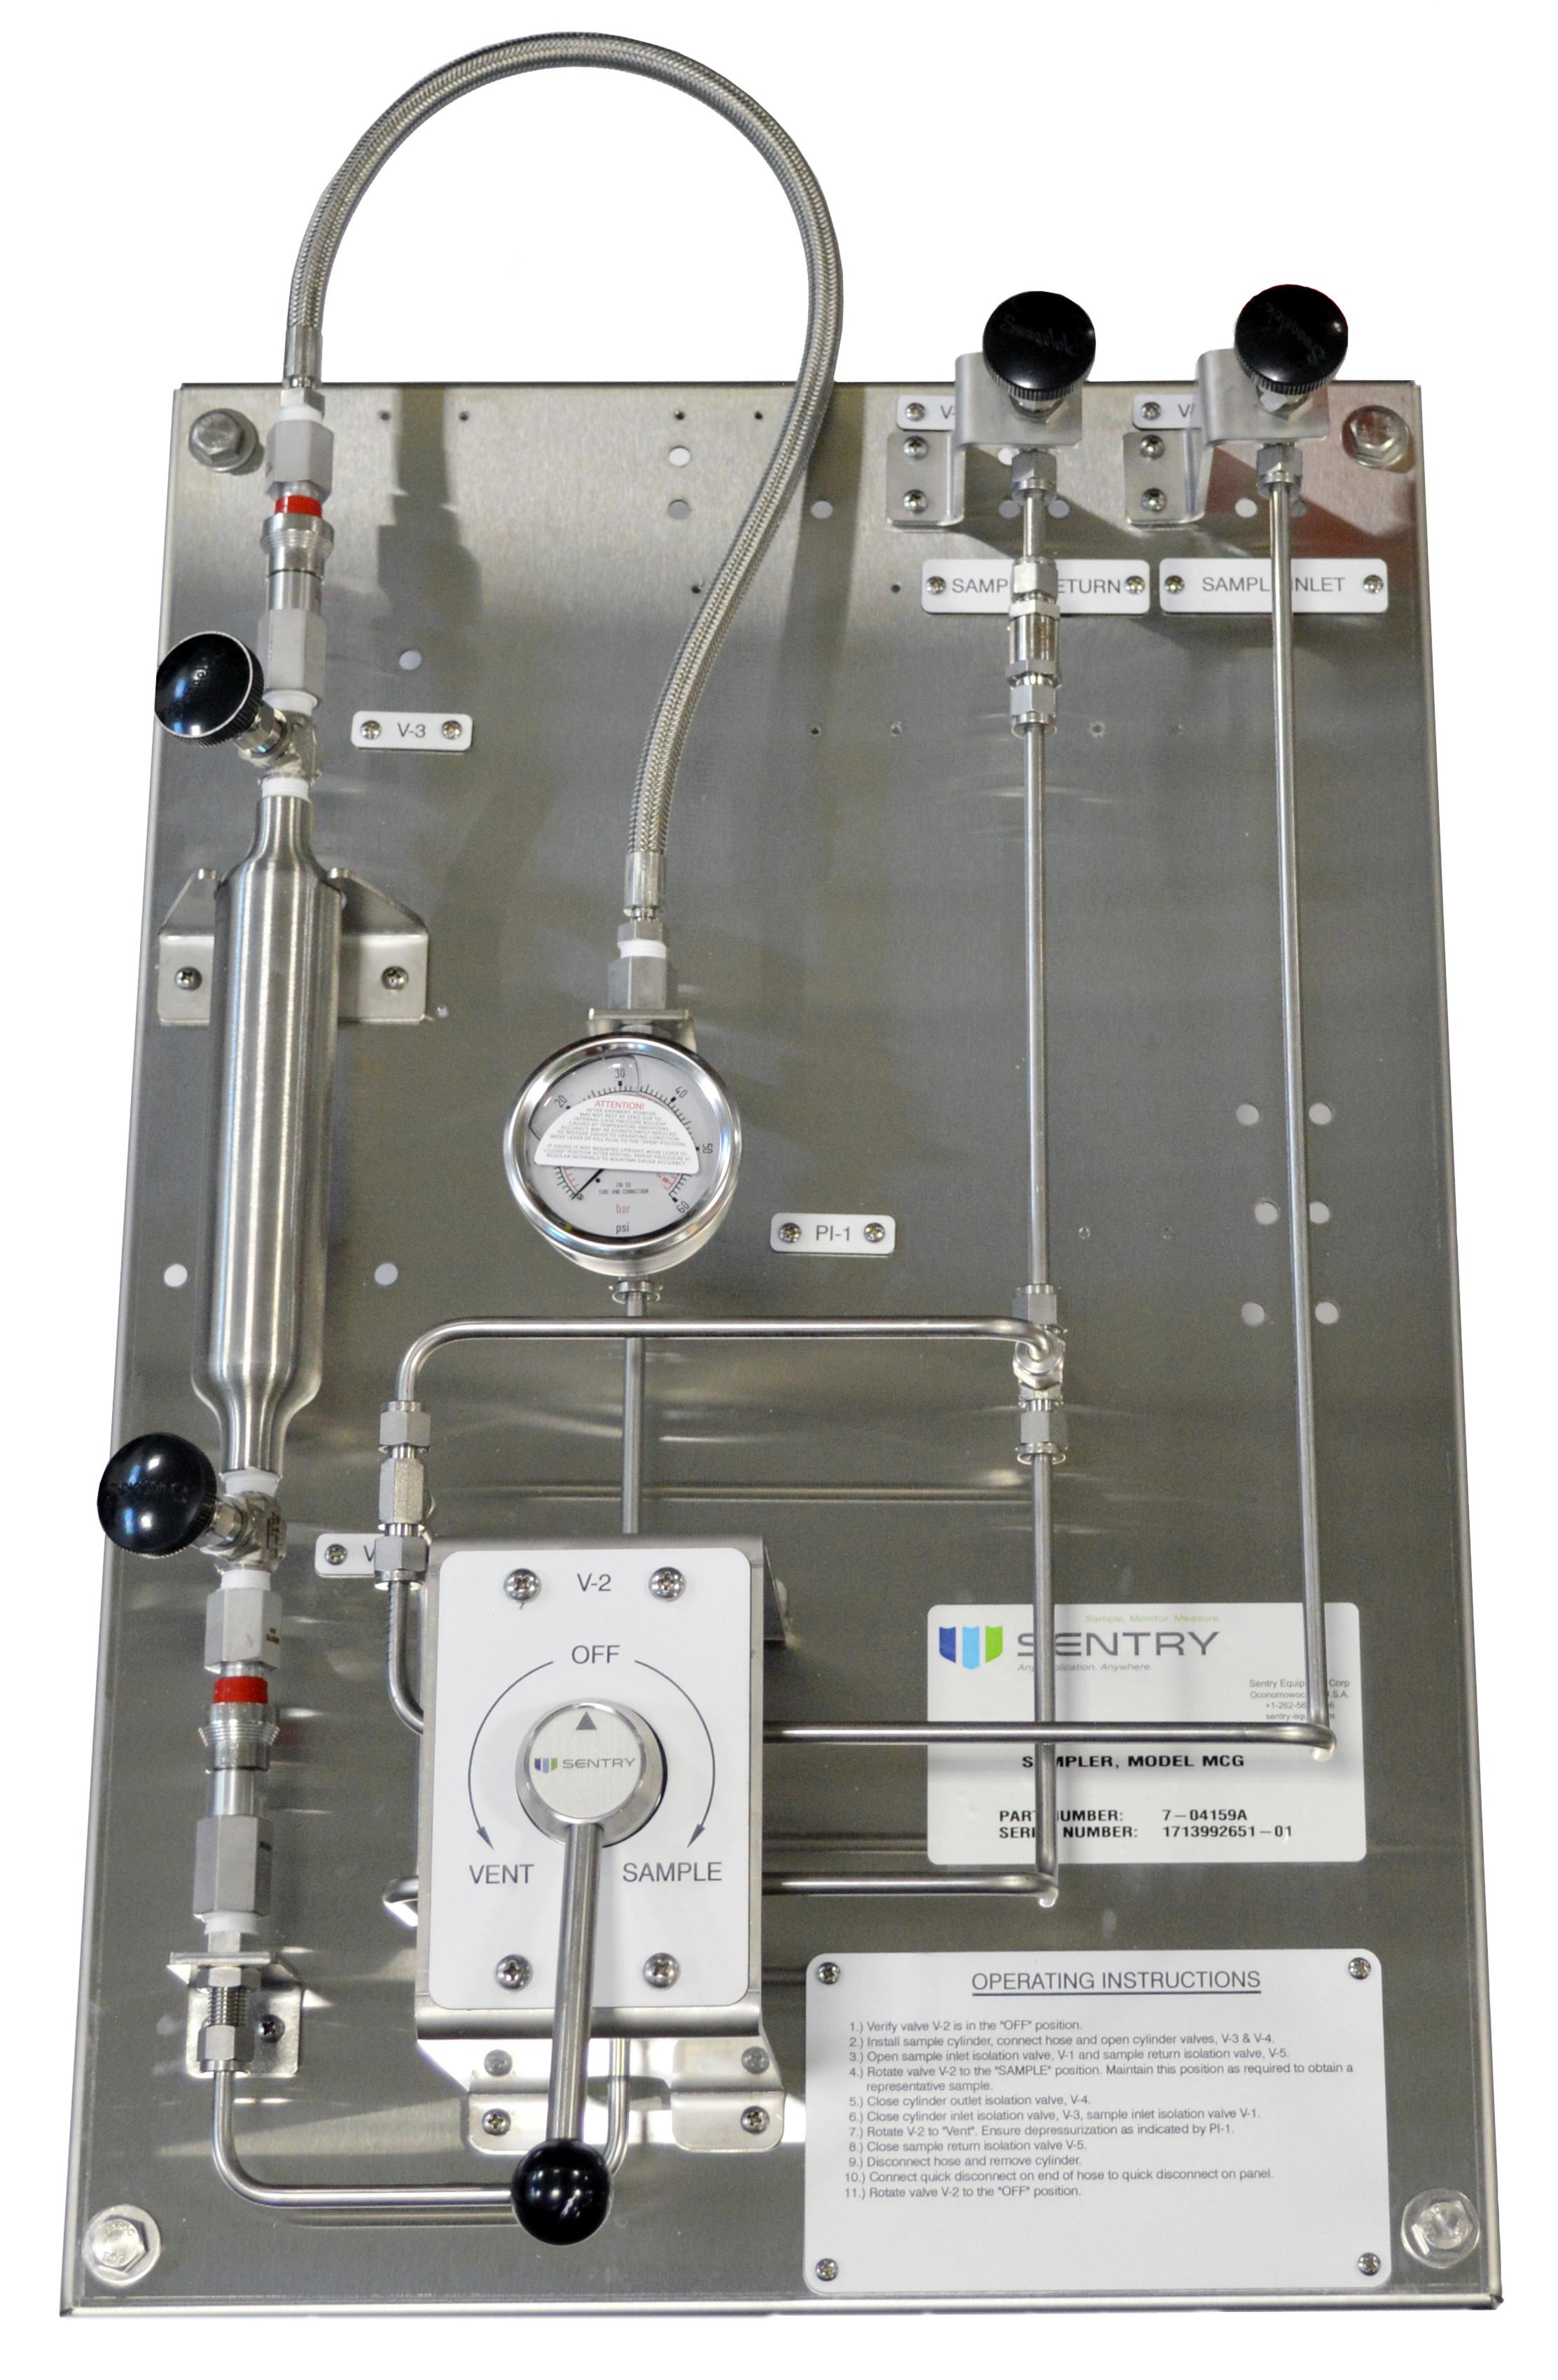 Sentry MCG Panel for Gas Sampling